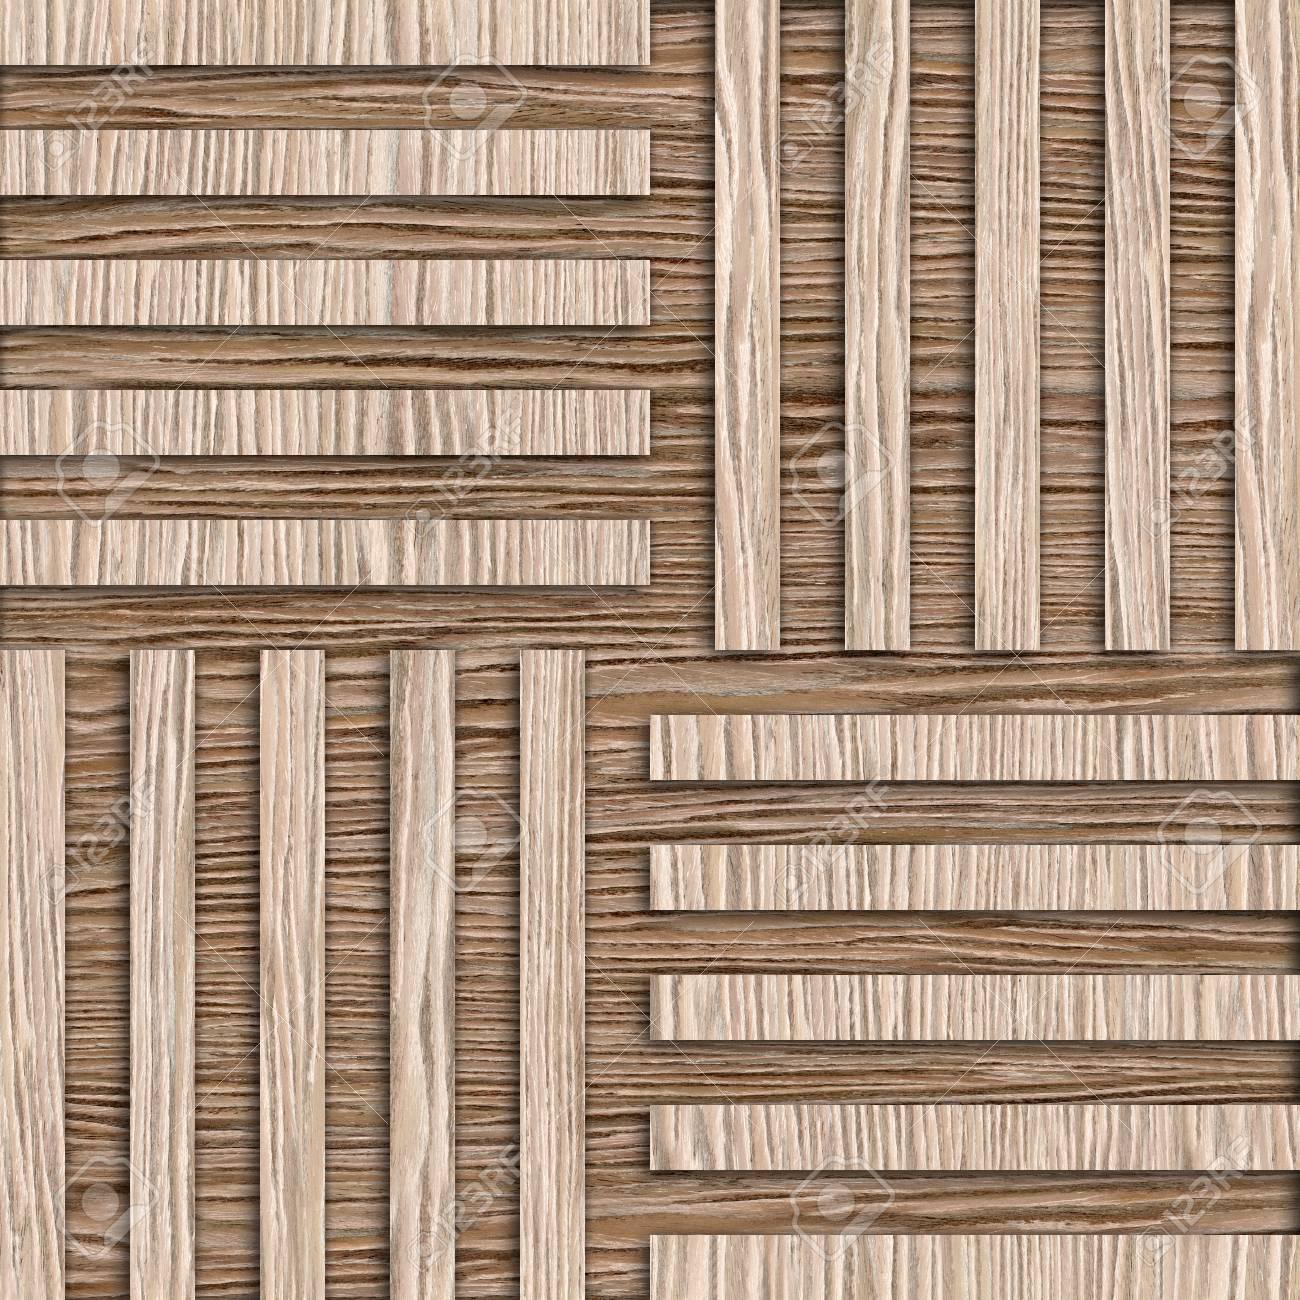 Lagra bästa värde 100% kvalitet Abstract Paneling Pattern - Seamless Background - Blasted Oak ...